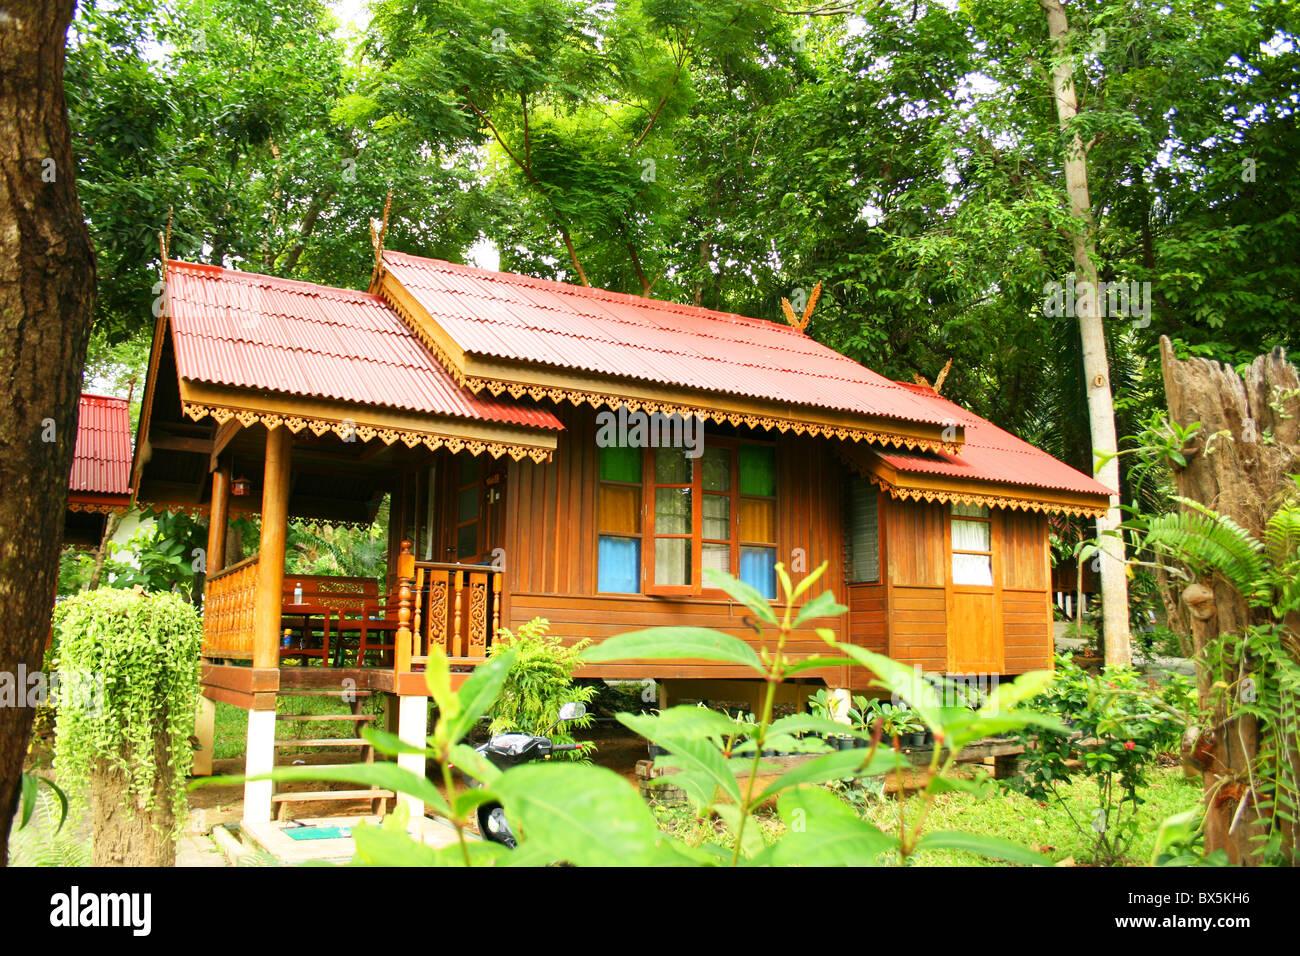 Beach hut on Koh Samet island in Thailand Stock Photo: 33316562 - Alamy